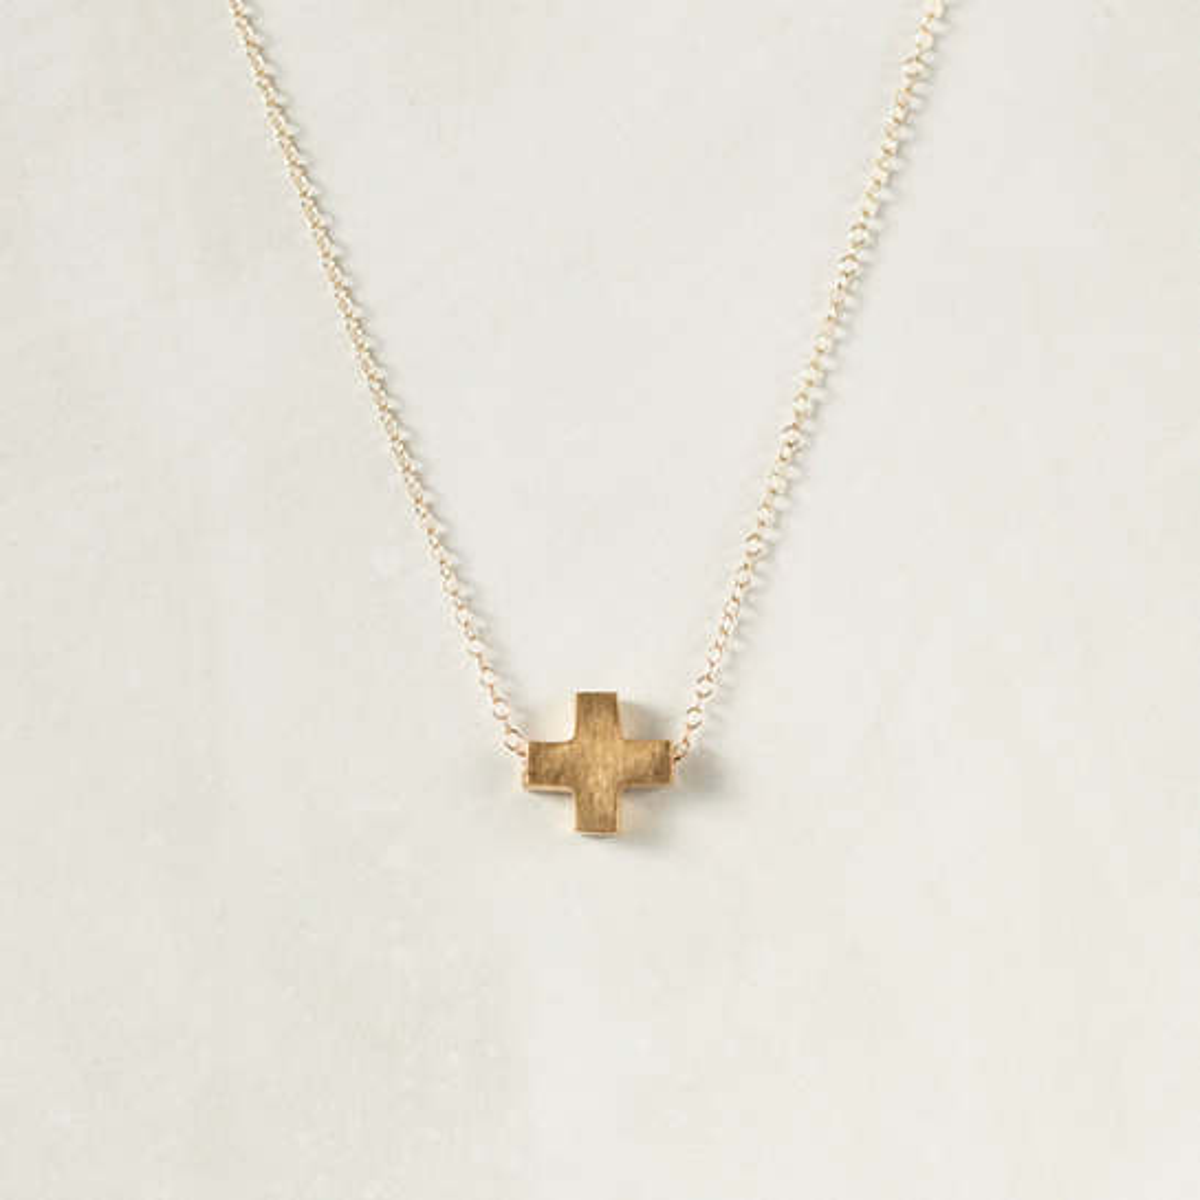 X Necklace